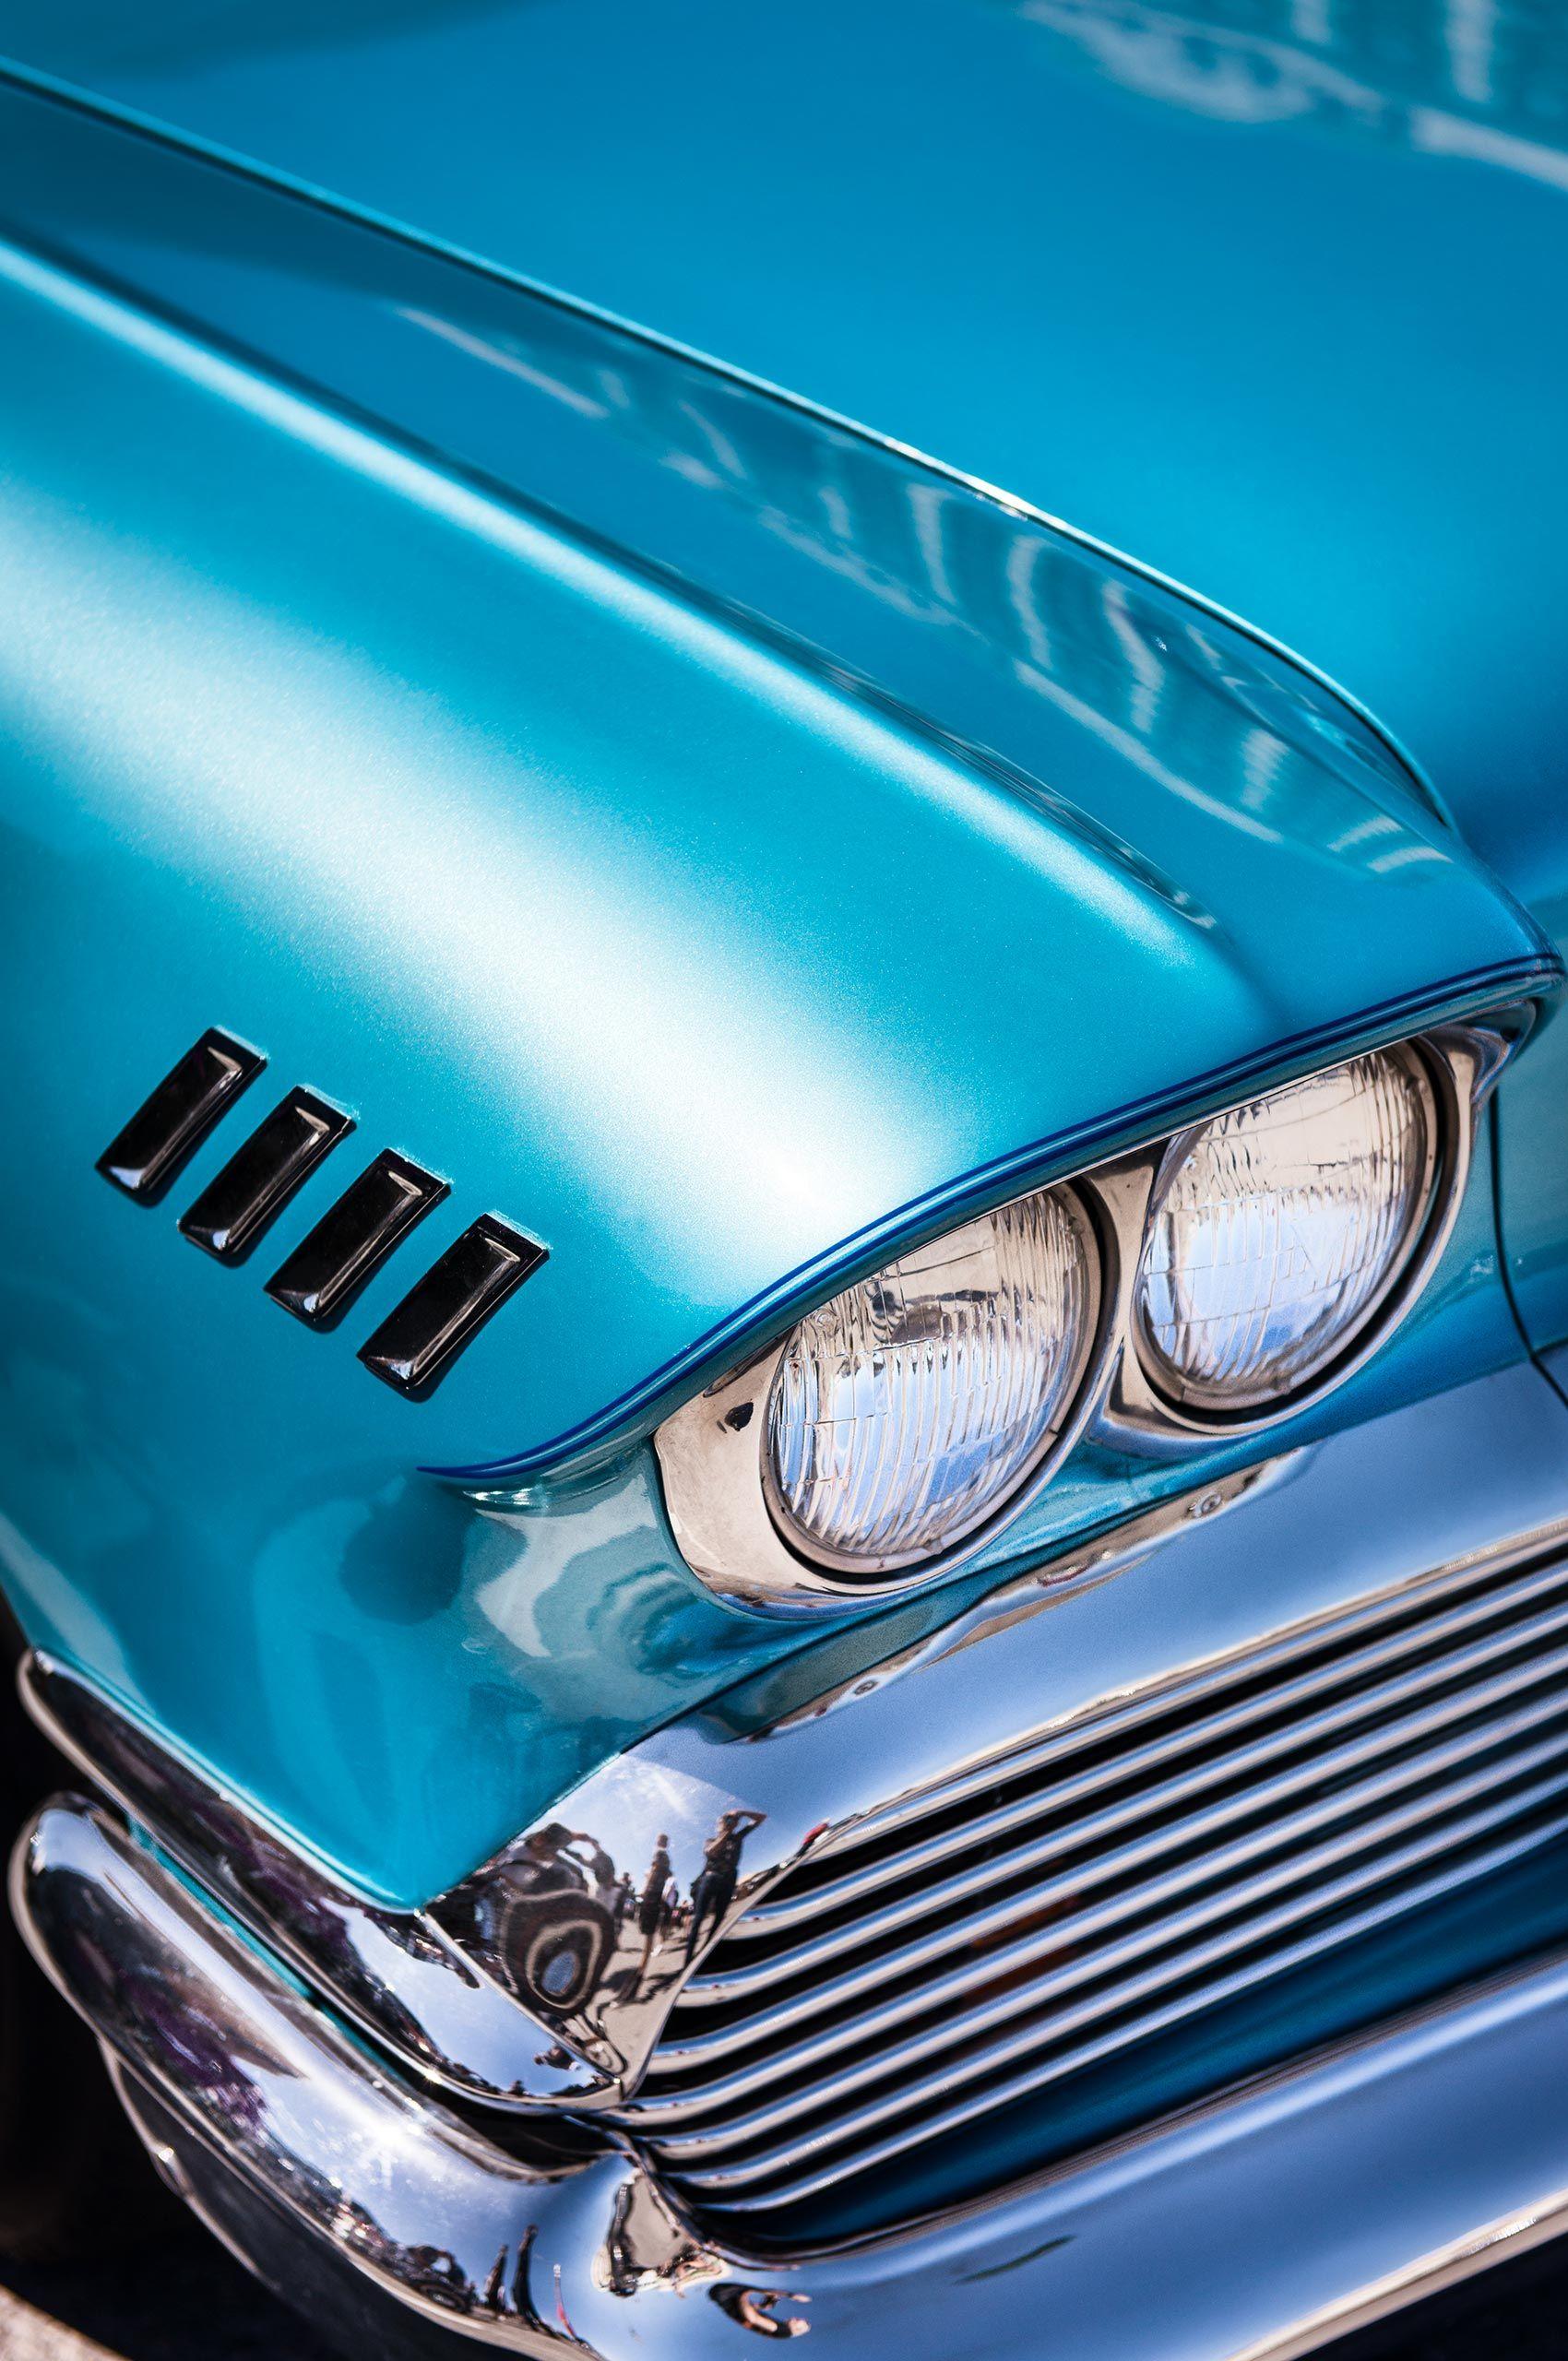 classic-car-headlights-vivalasvegas-HenrikOlundPhotography.jpg